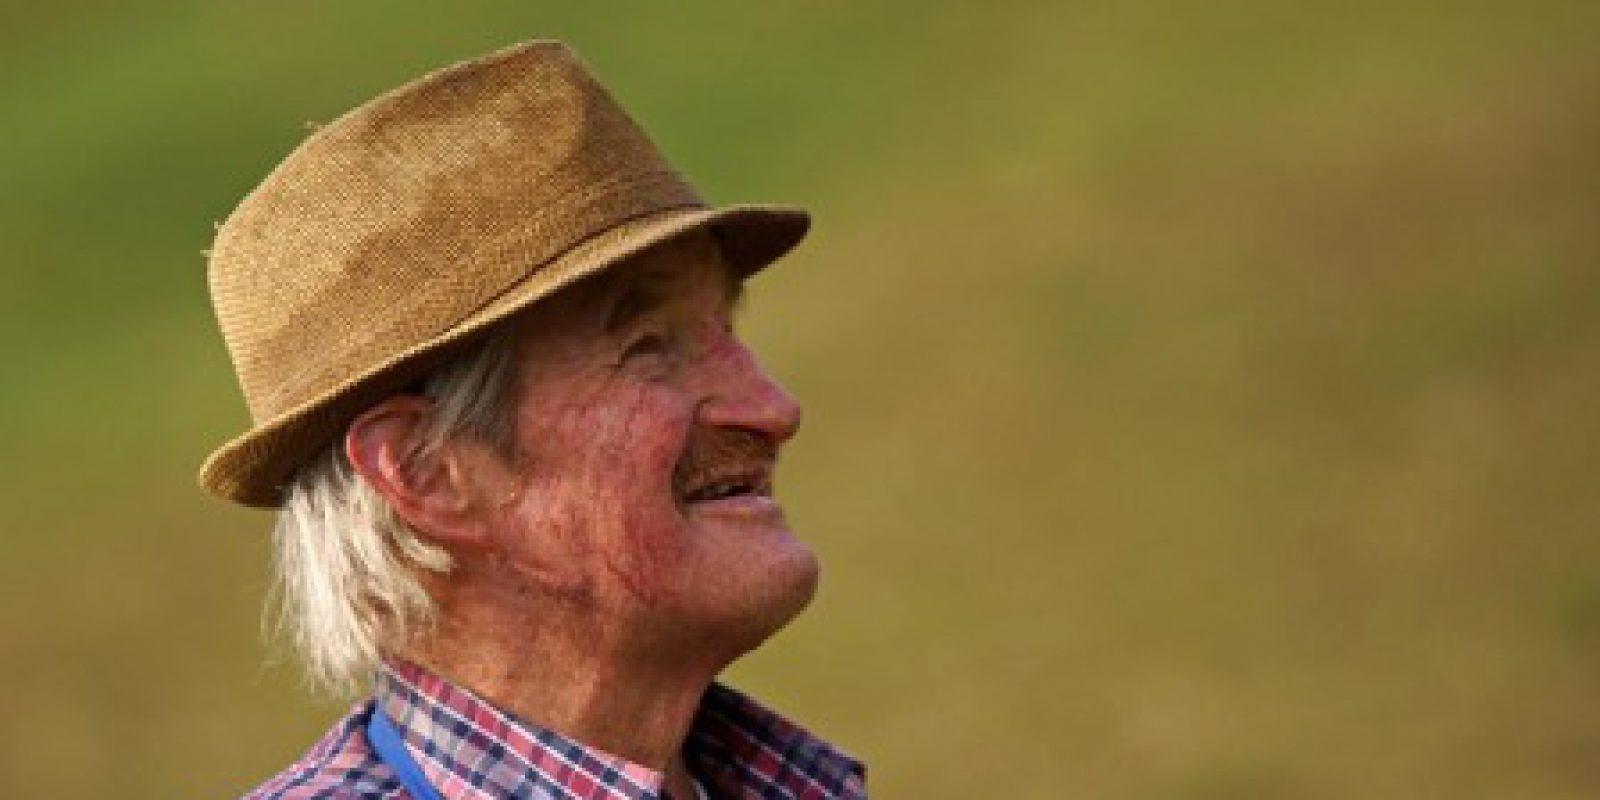 My neighbor, Jed, the retired farmer.